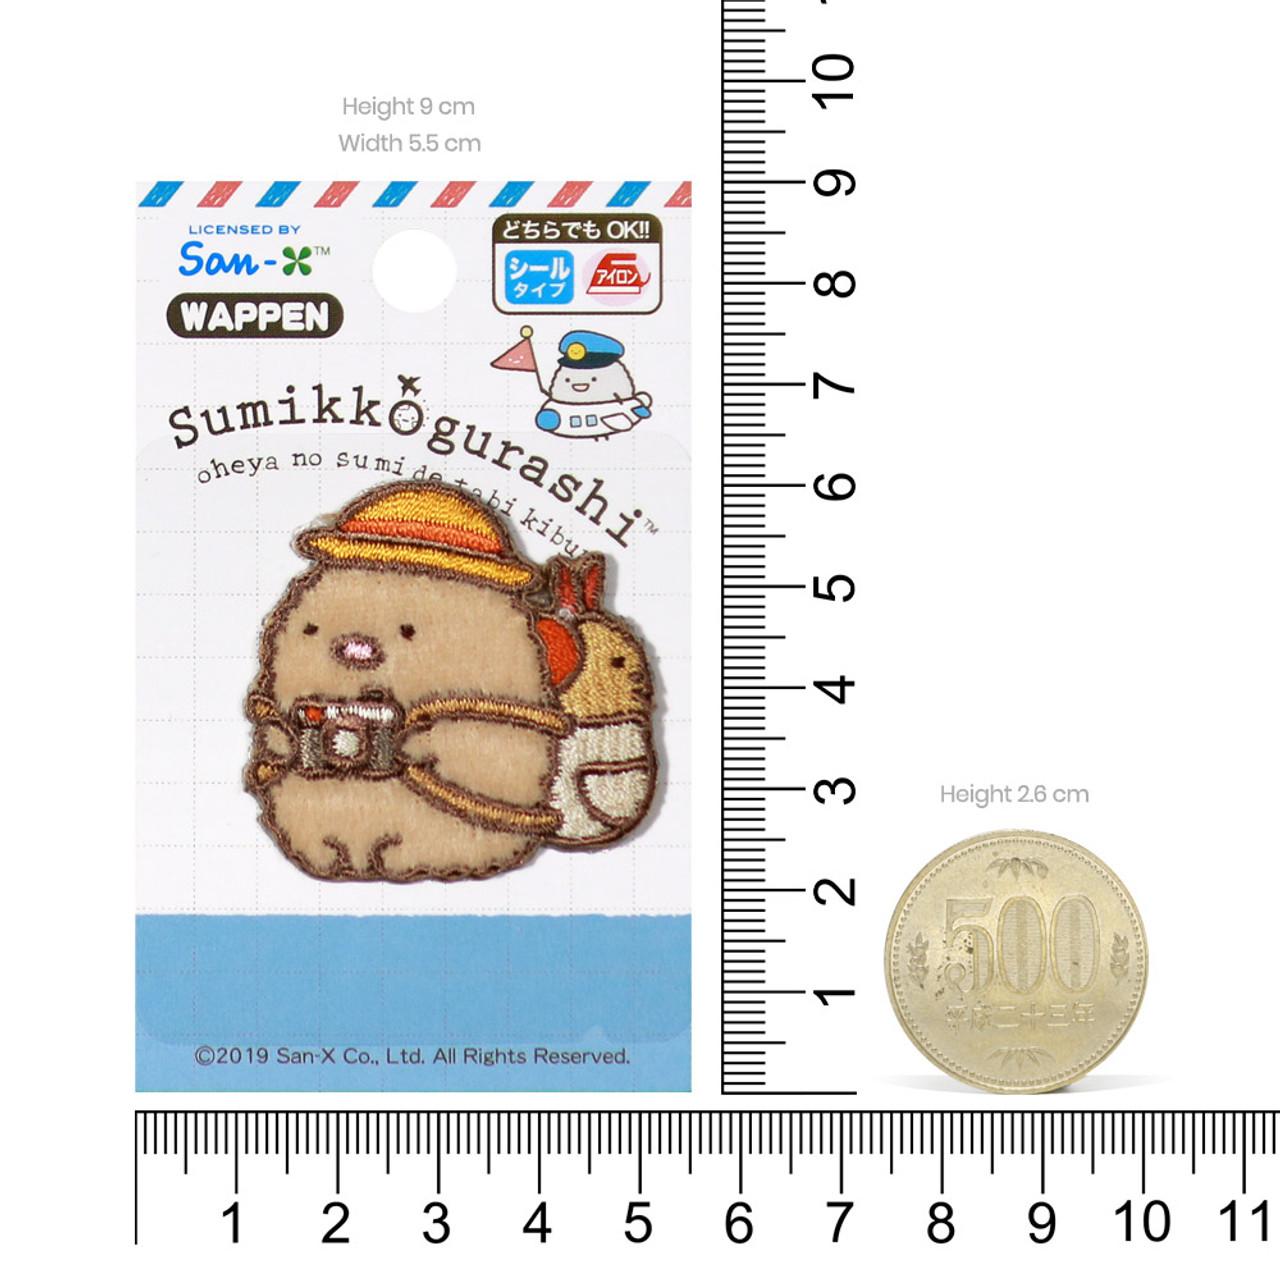 Sumikko Gurashi Iron On Patch Pork Cutlet Being Backpacker PSU108 ( Proportion )